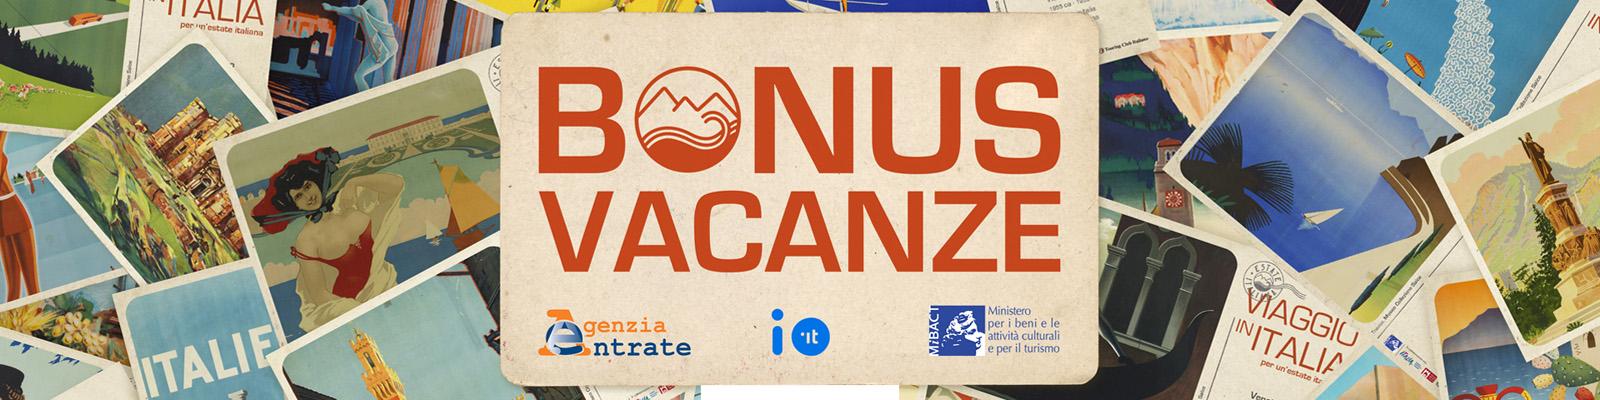 Bonus Vacanze slider